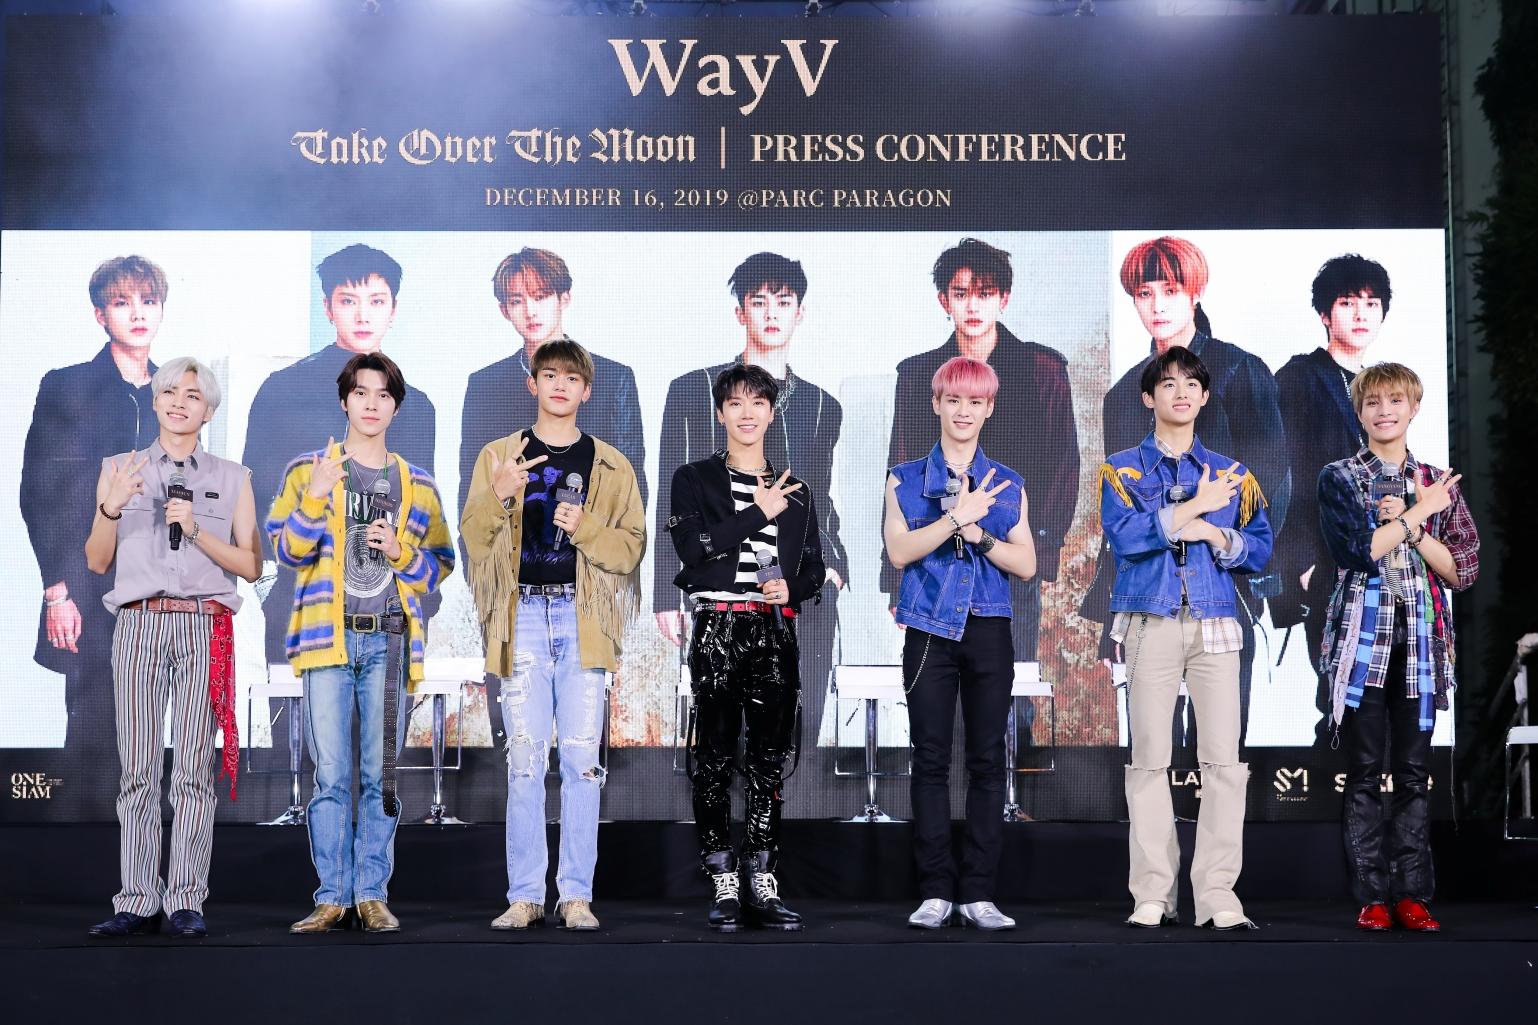 [Press Conference & Fan Signing_Image 2] WayV